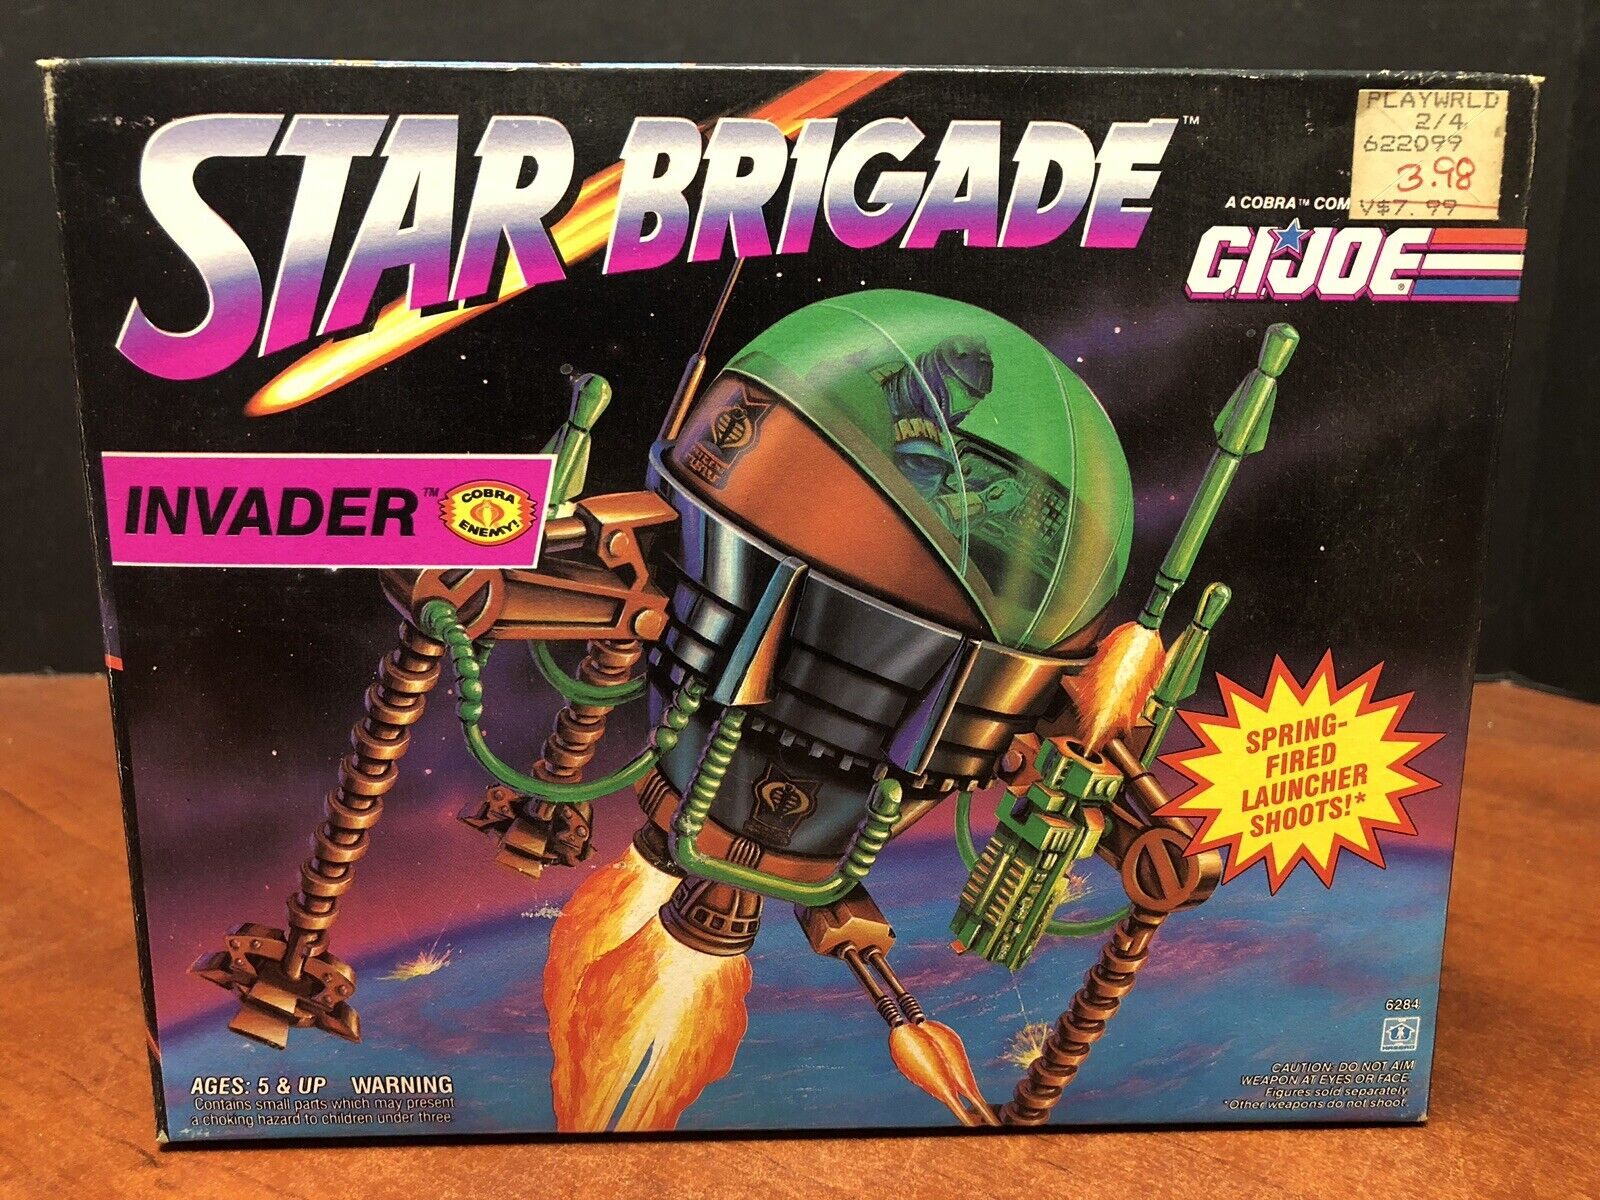 GI Joe 1993 estrella Brigade Invader Sealed Dela0279